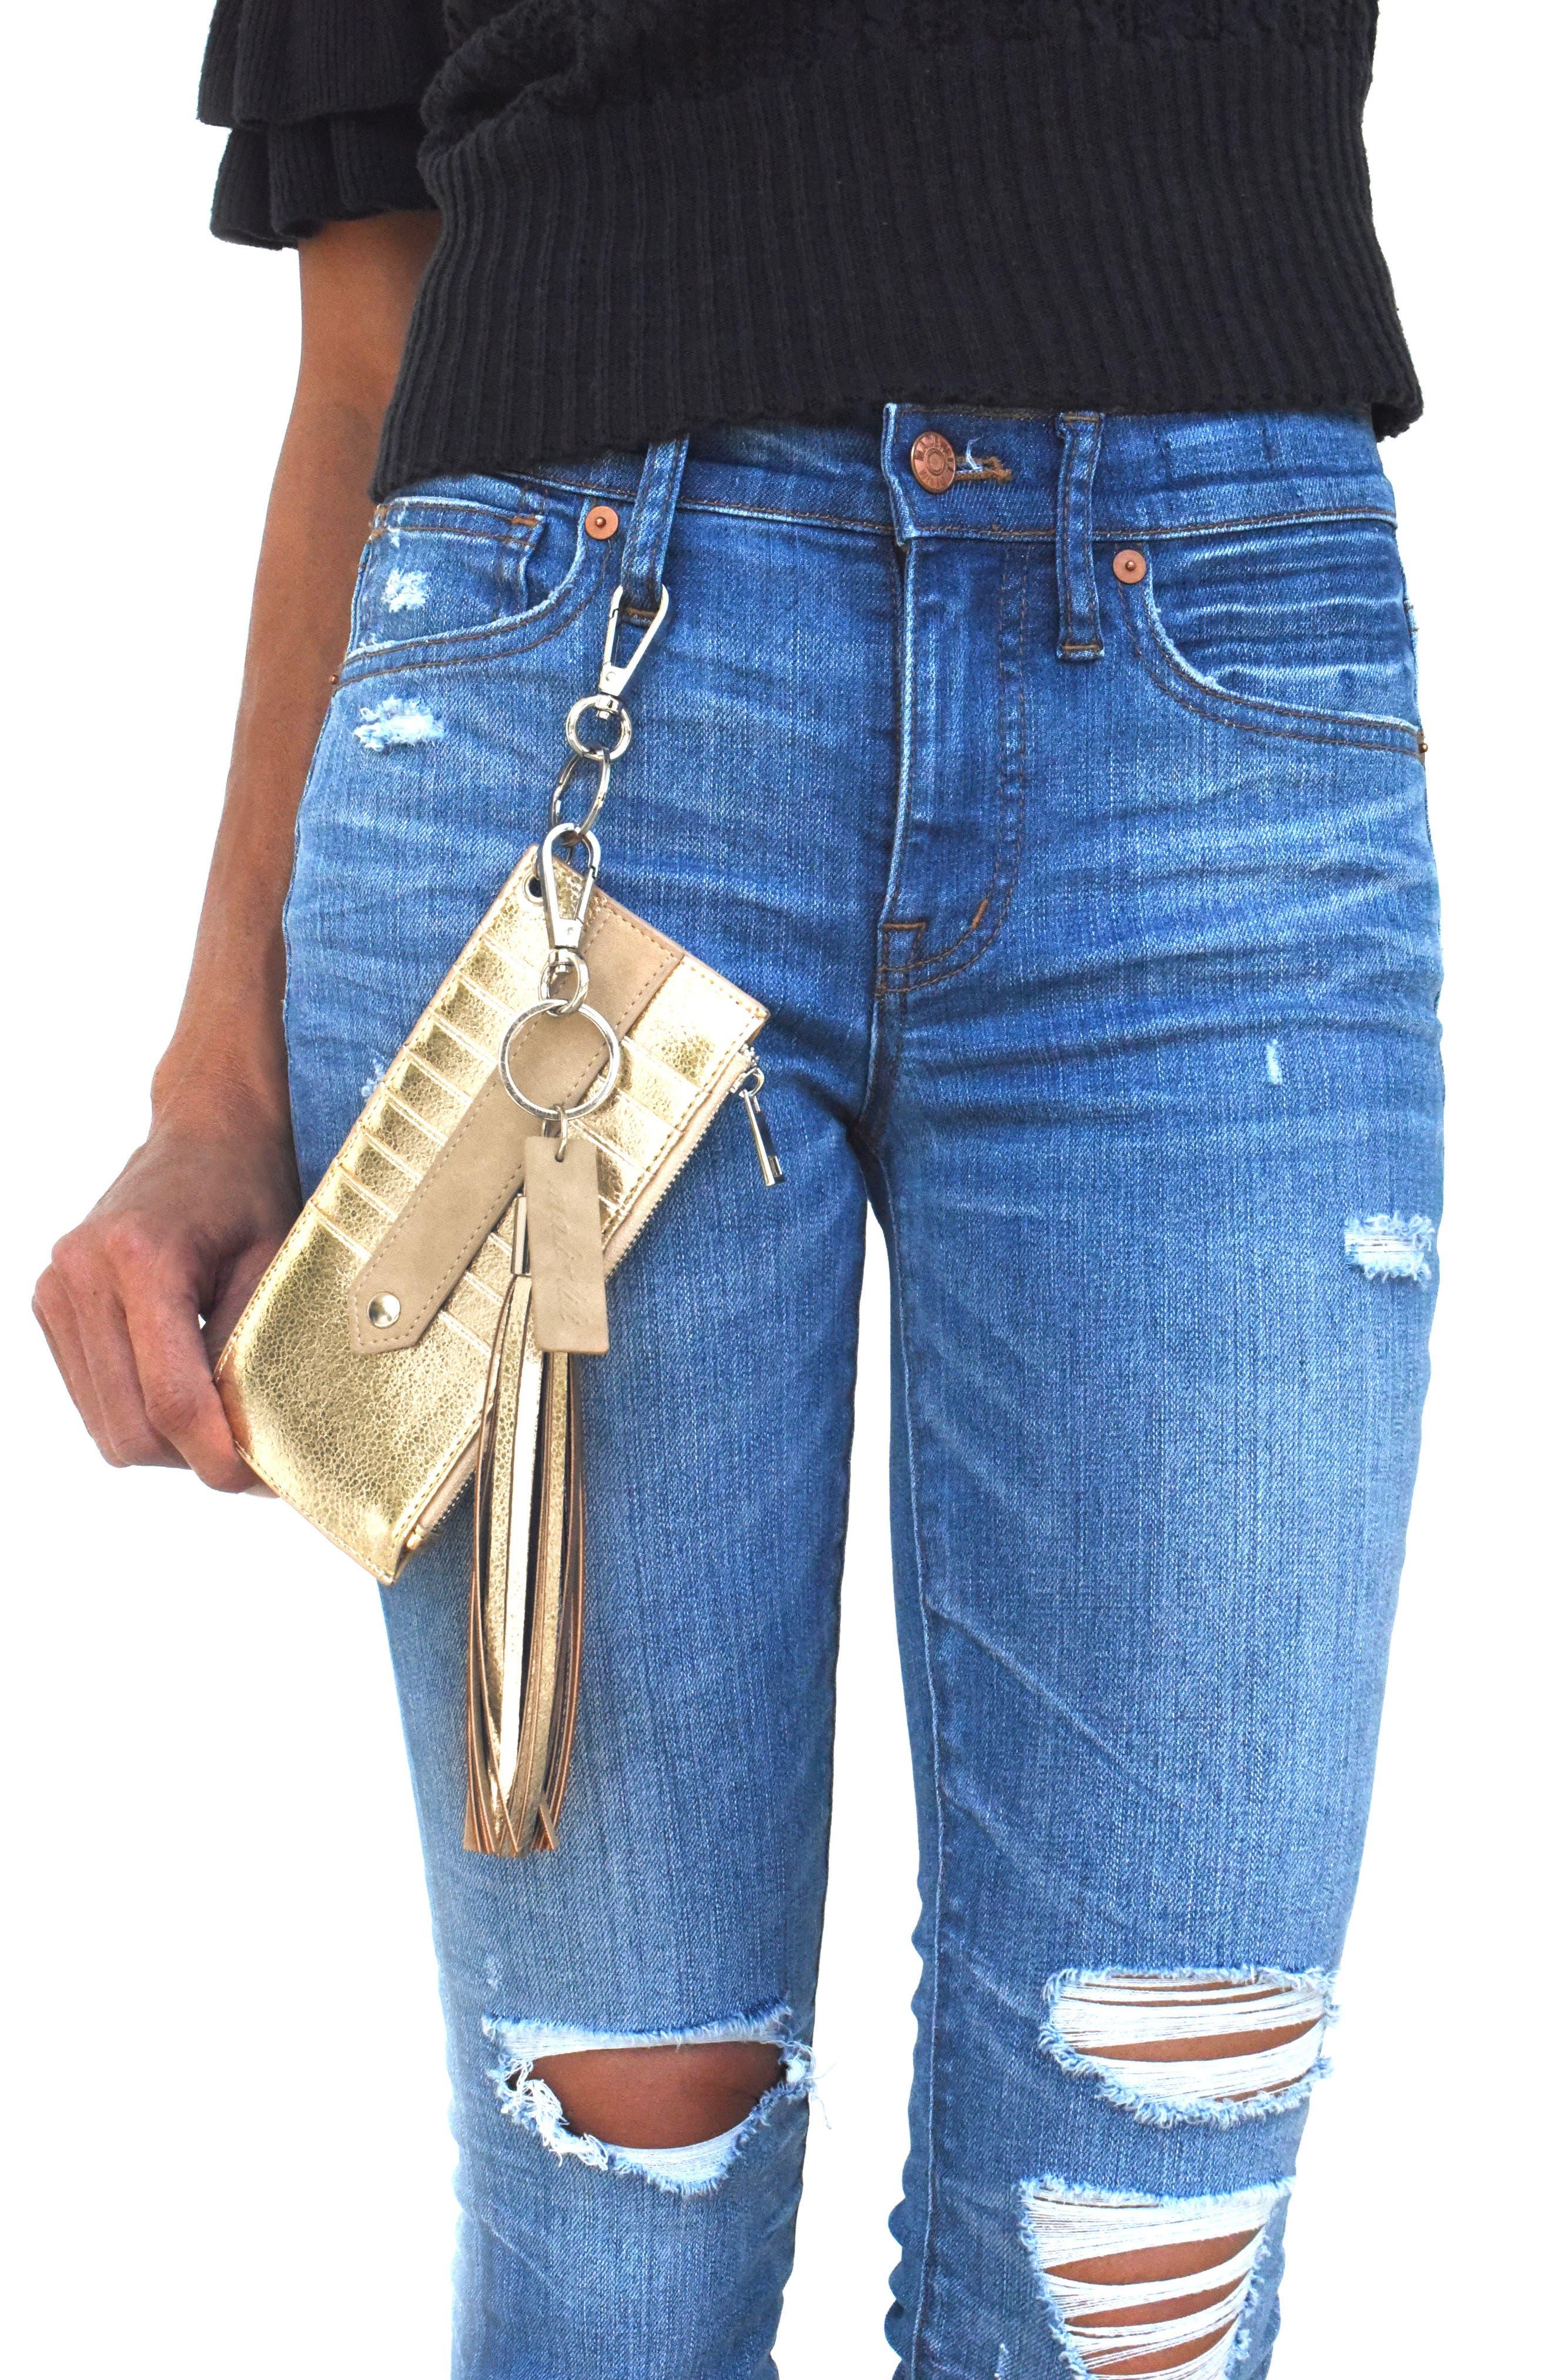 Mali + Lili Sydney Vegan Leather Card Case with Tassel Charm,                             Alternate thumbnail 9, color,